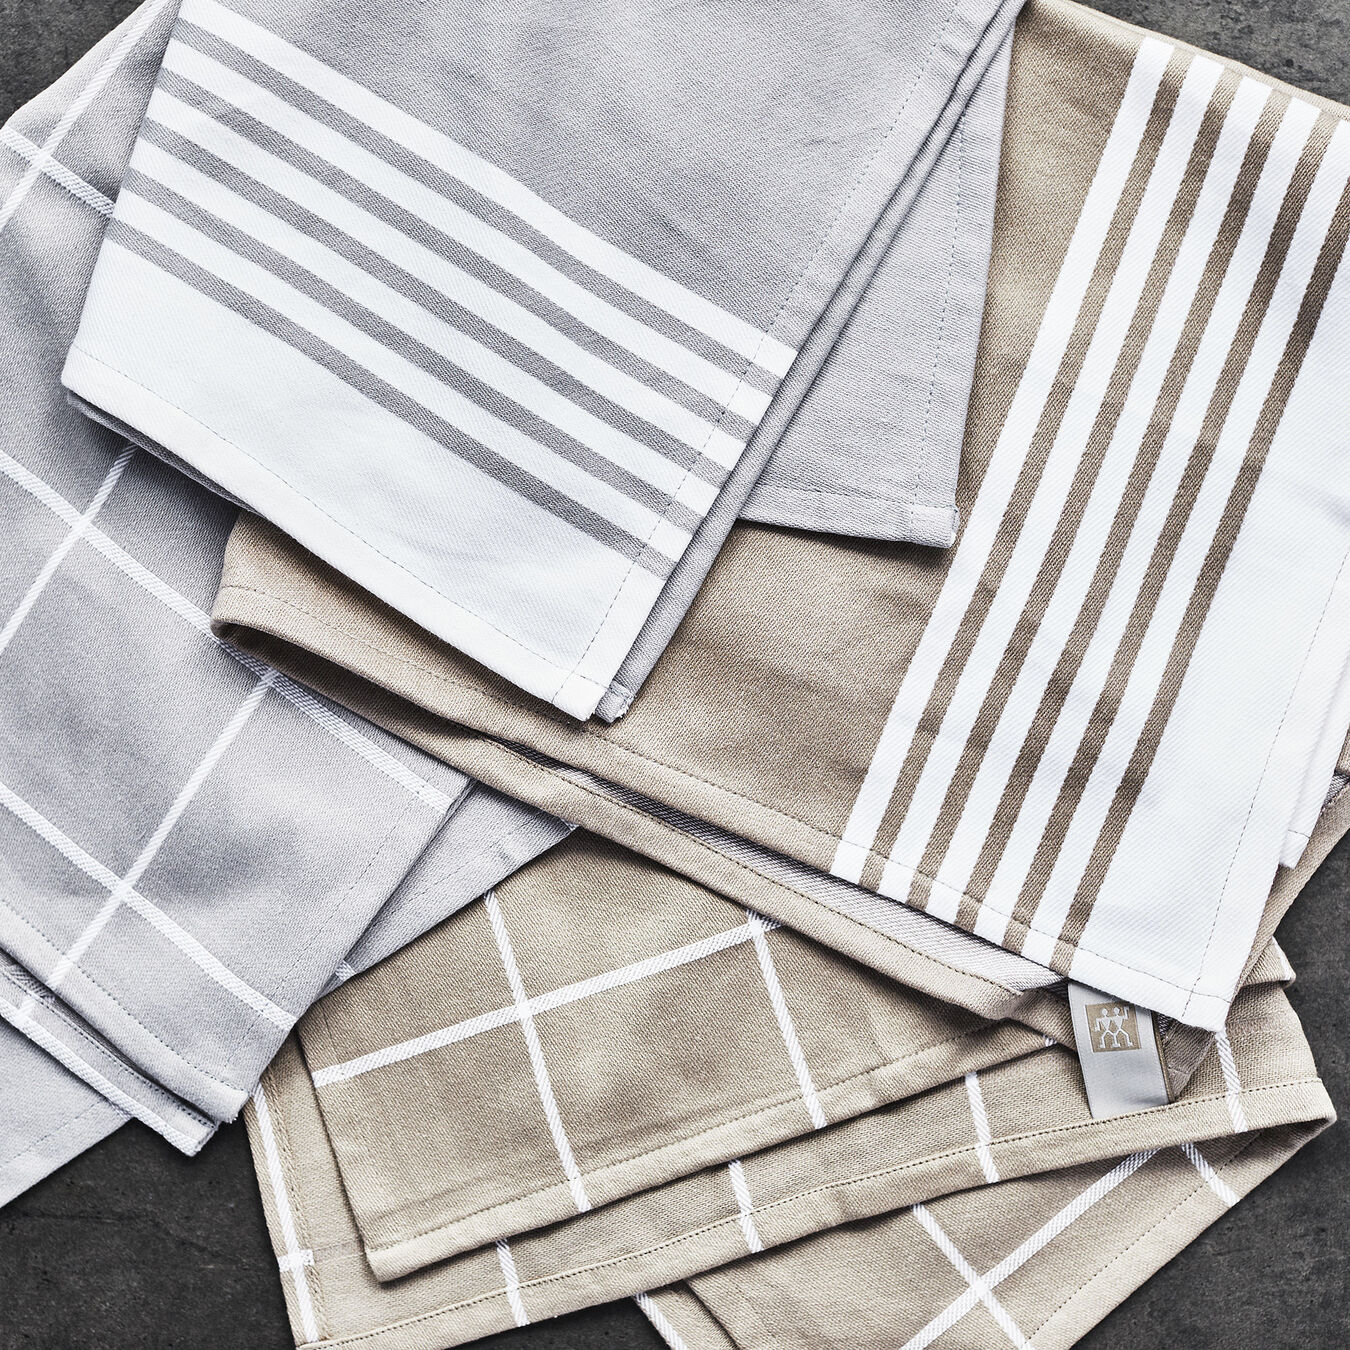 4-pc Kitchen Towel Set - Grey,,large 7